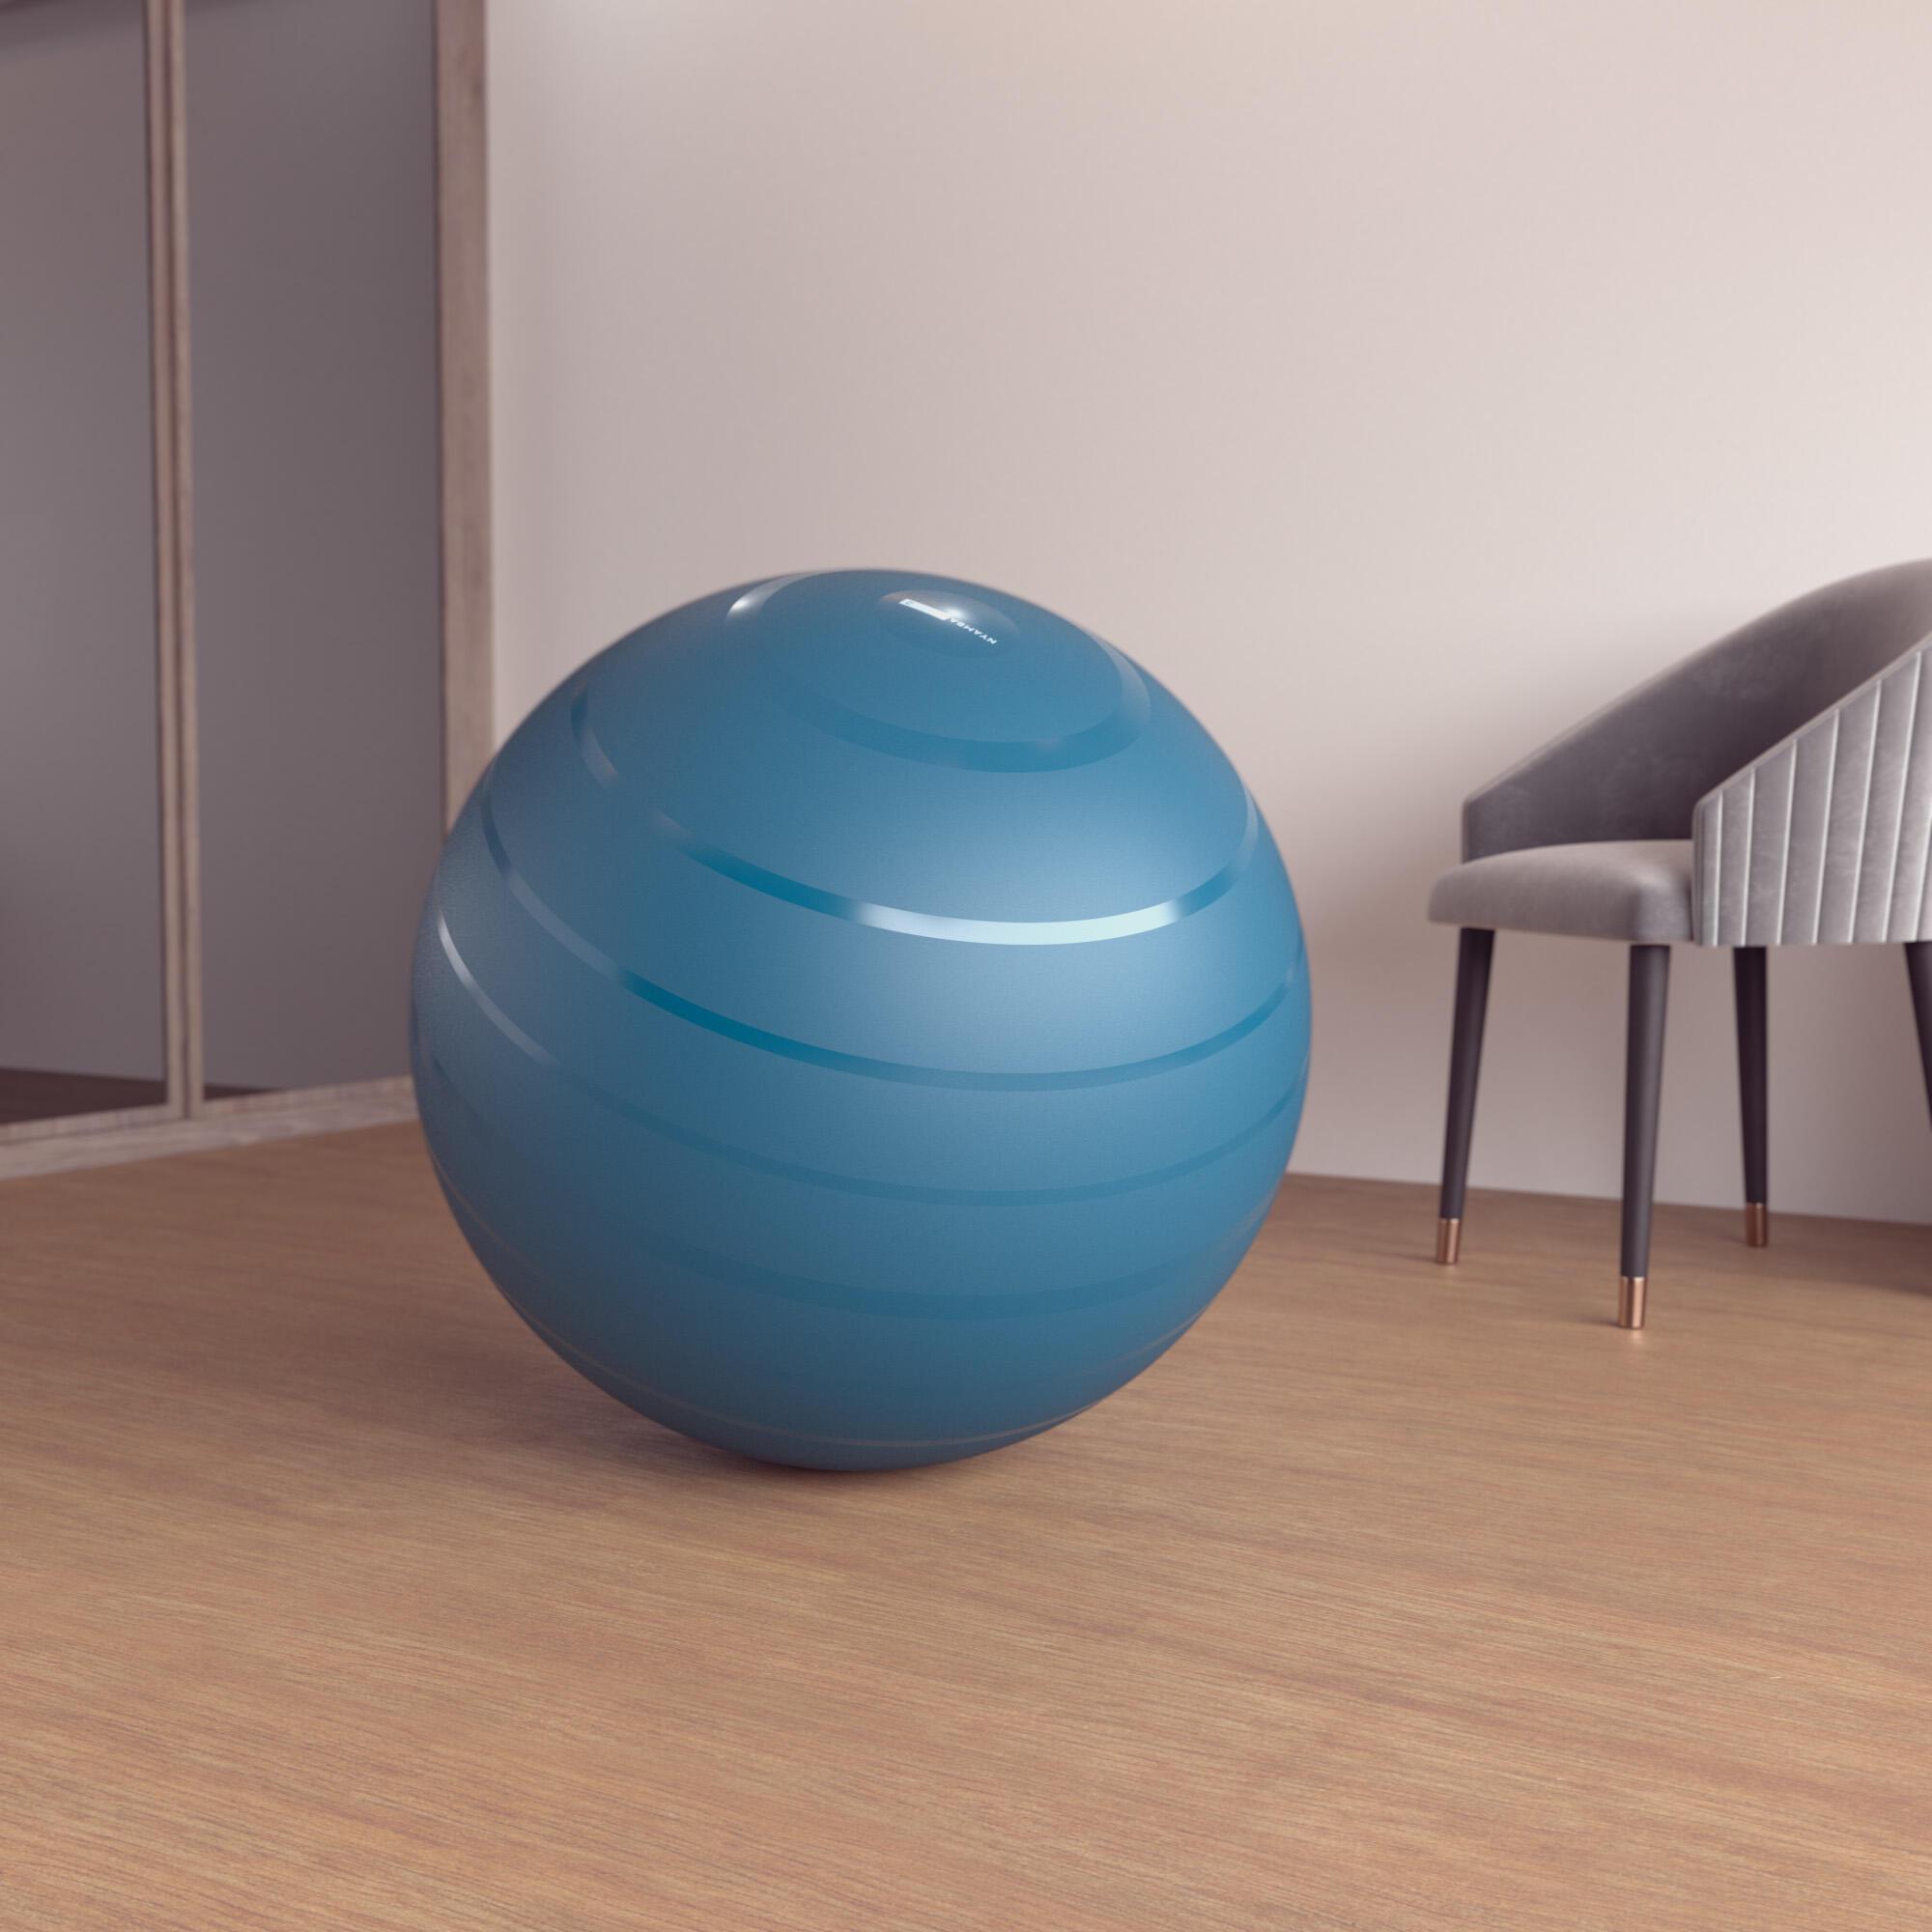 Minge SWISS BALL L Albastru imagine